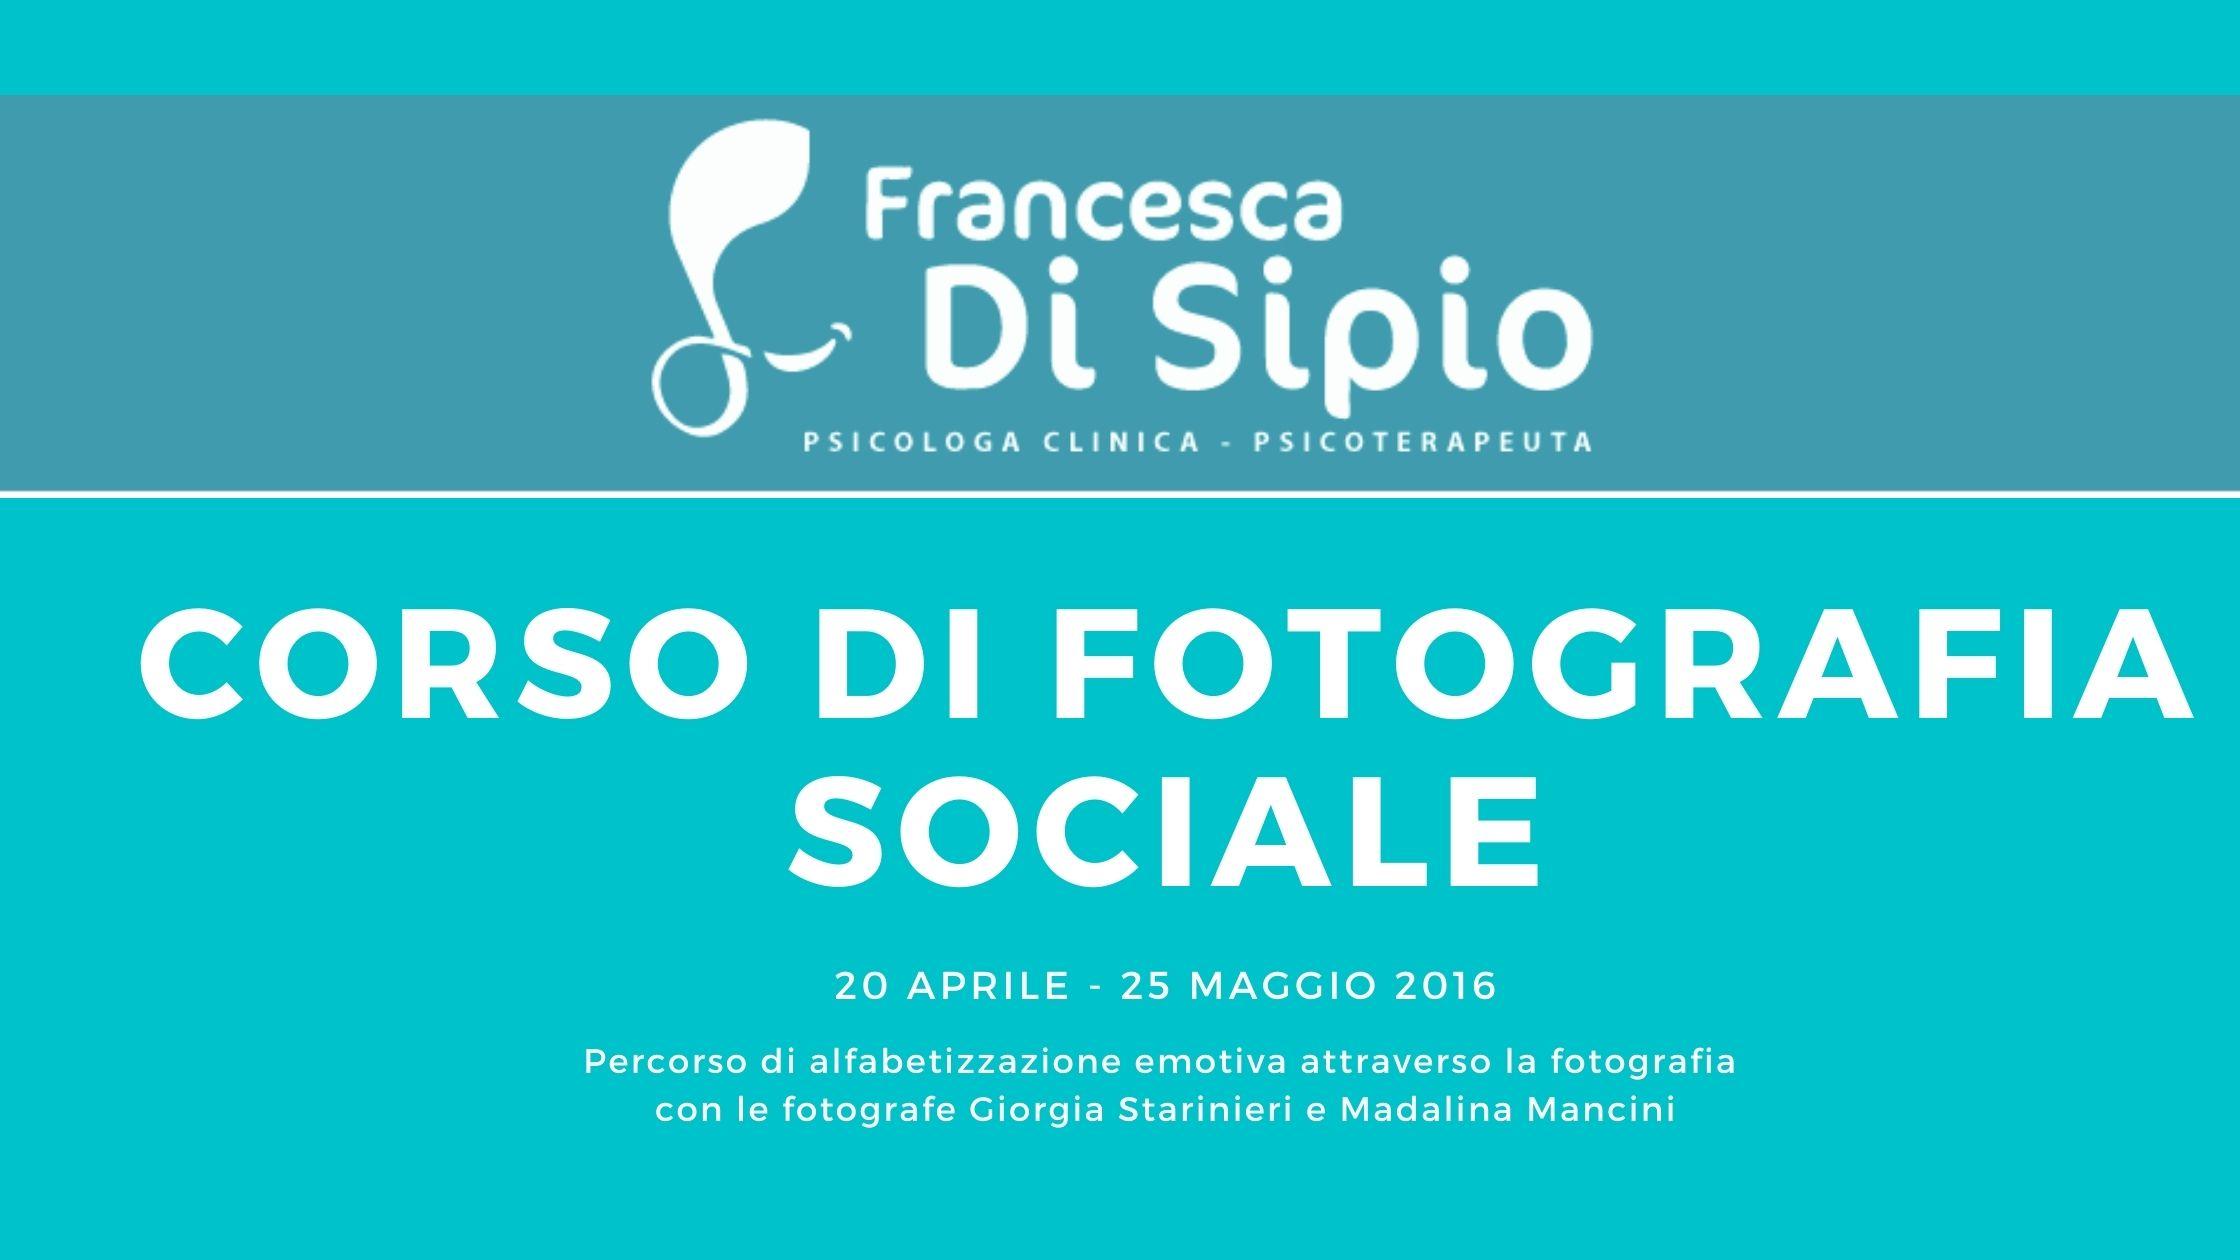 Fotografia sociale